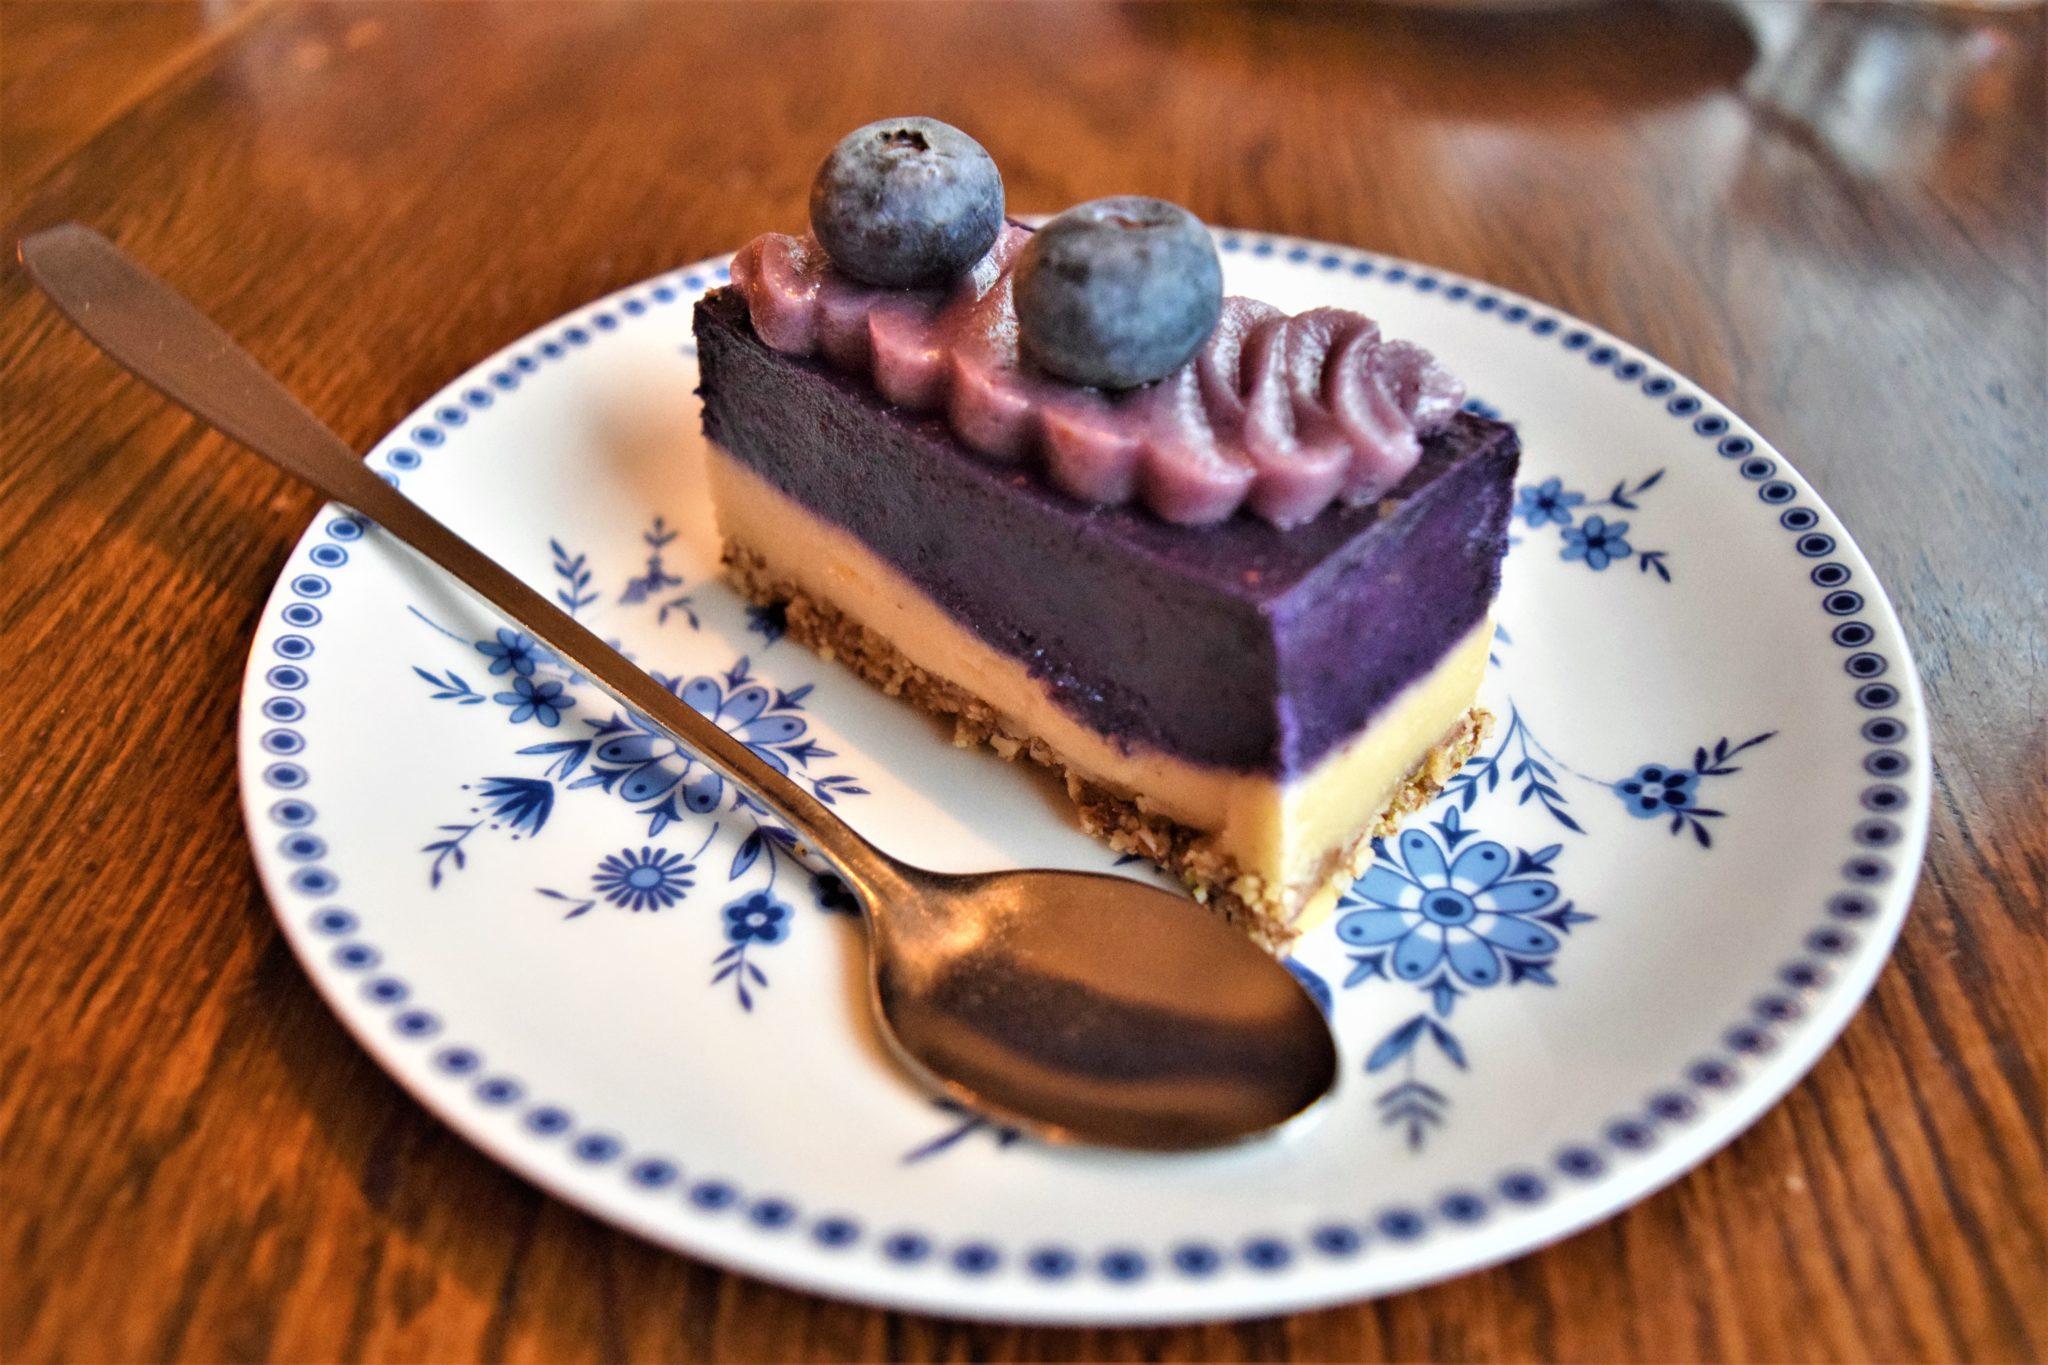 Vegan dessert, stockholm, sweden, hermans buffet